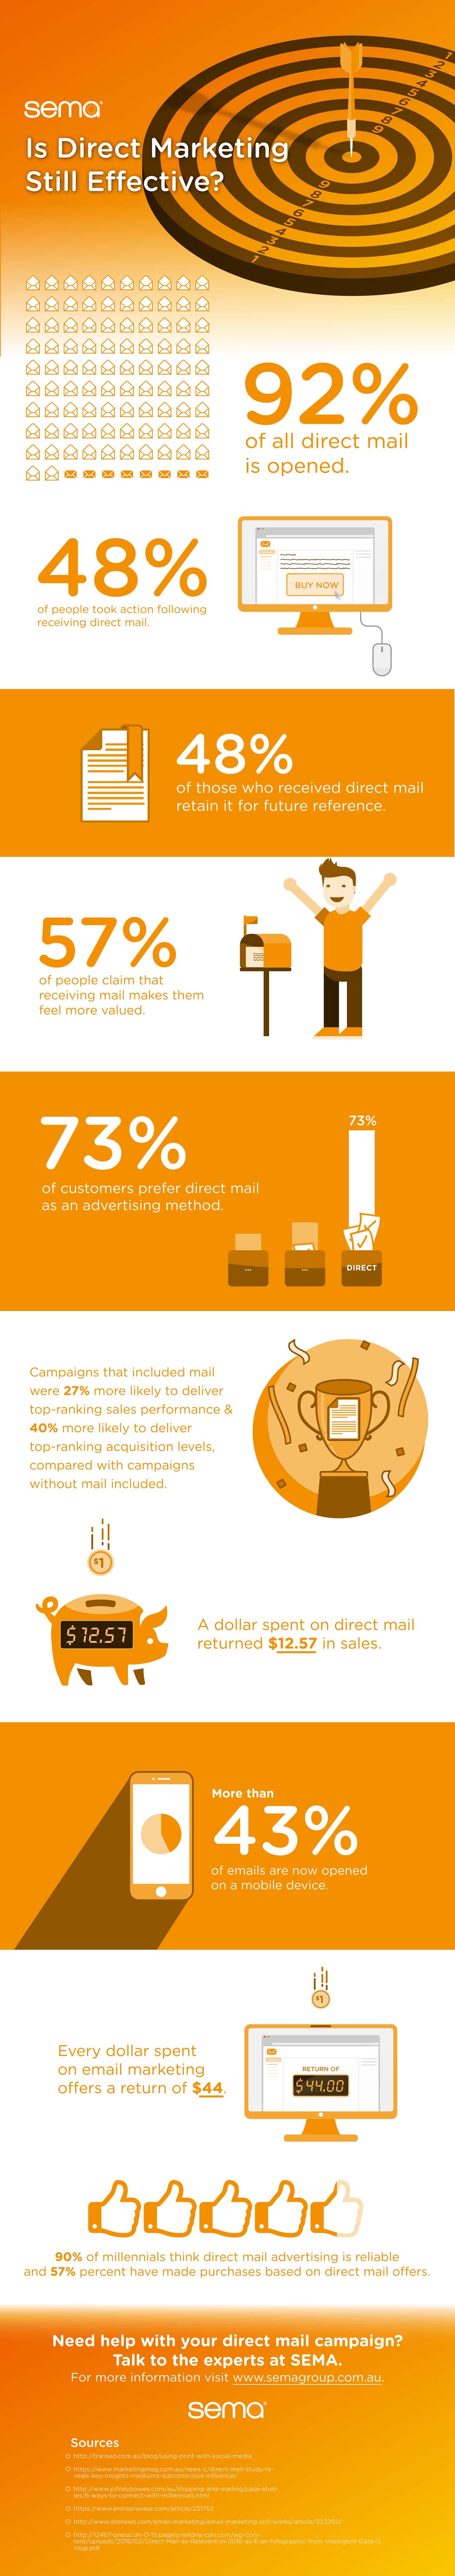 Is Direct Marketing Still Effective?